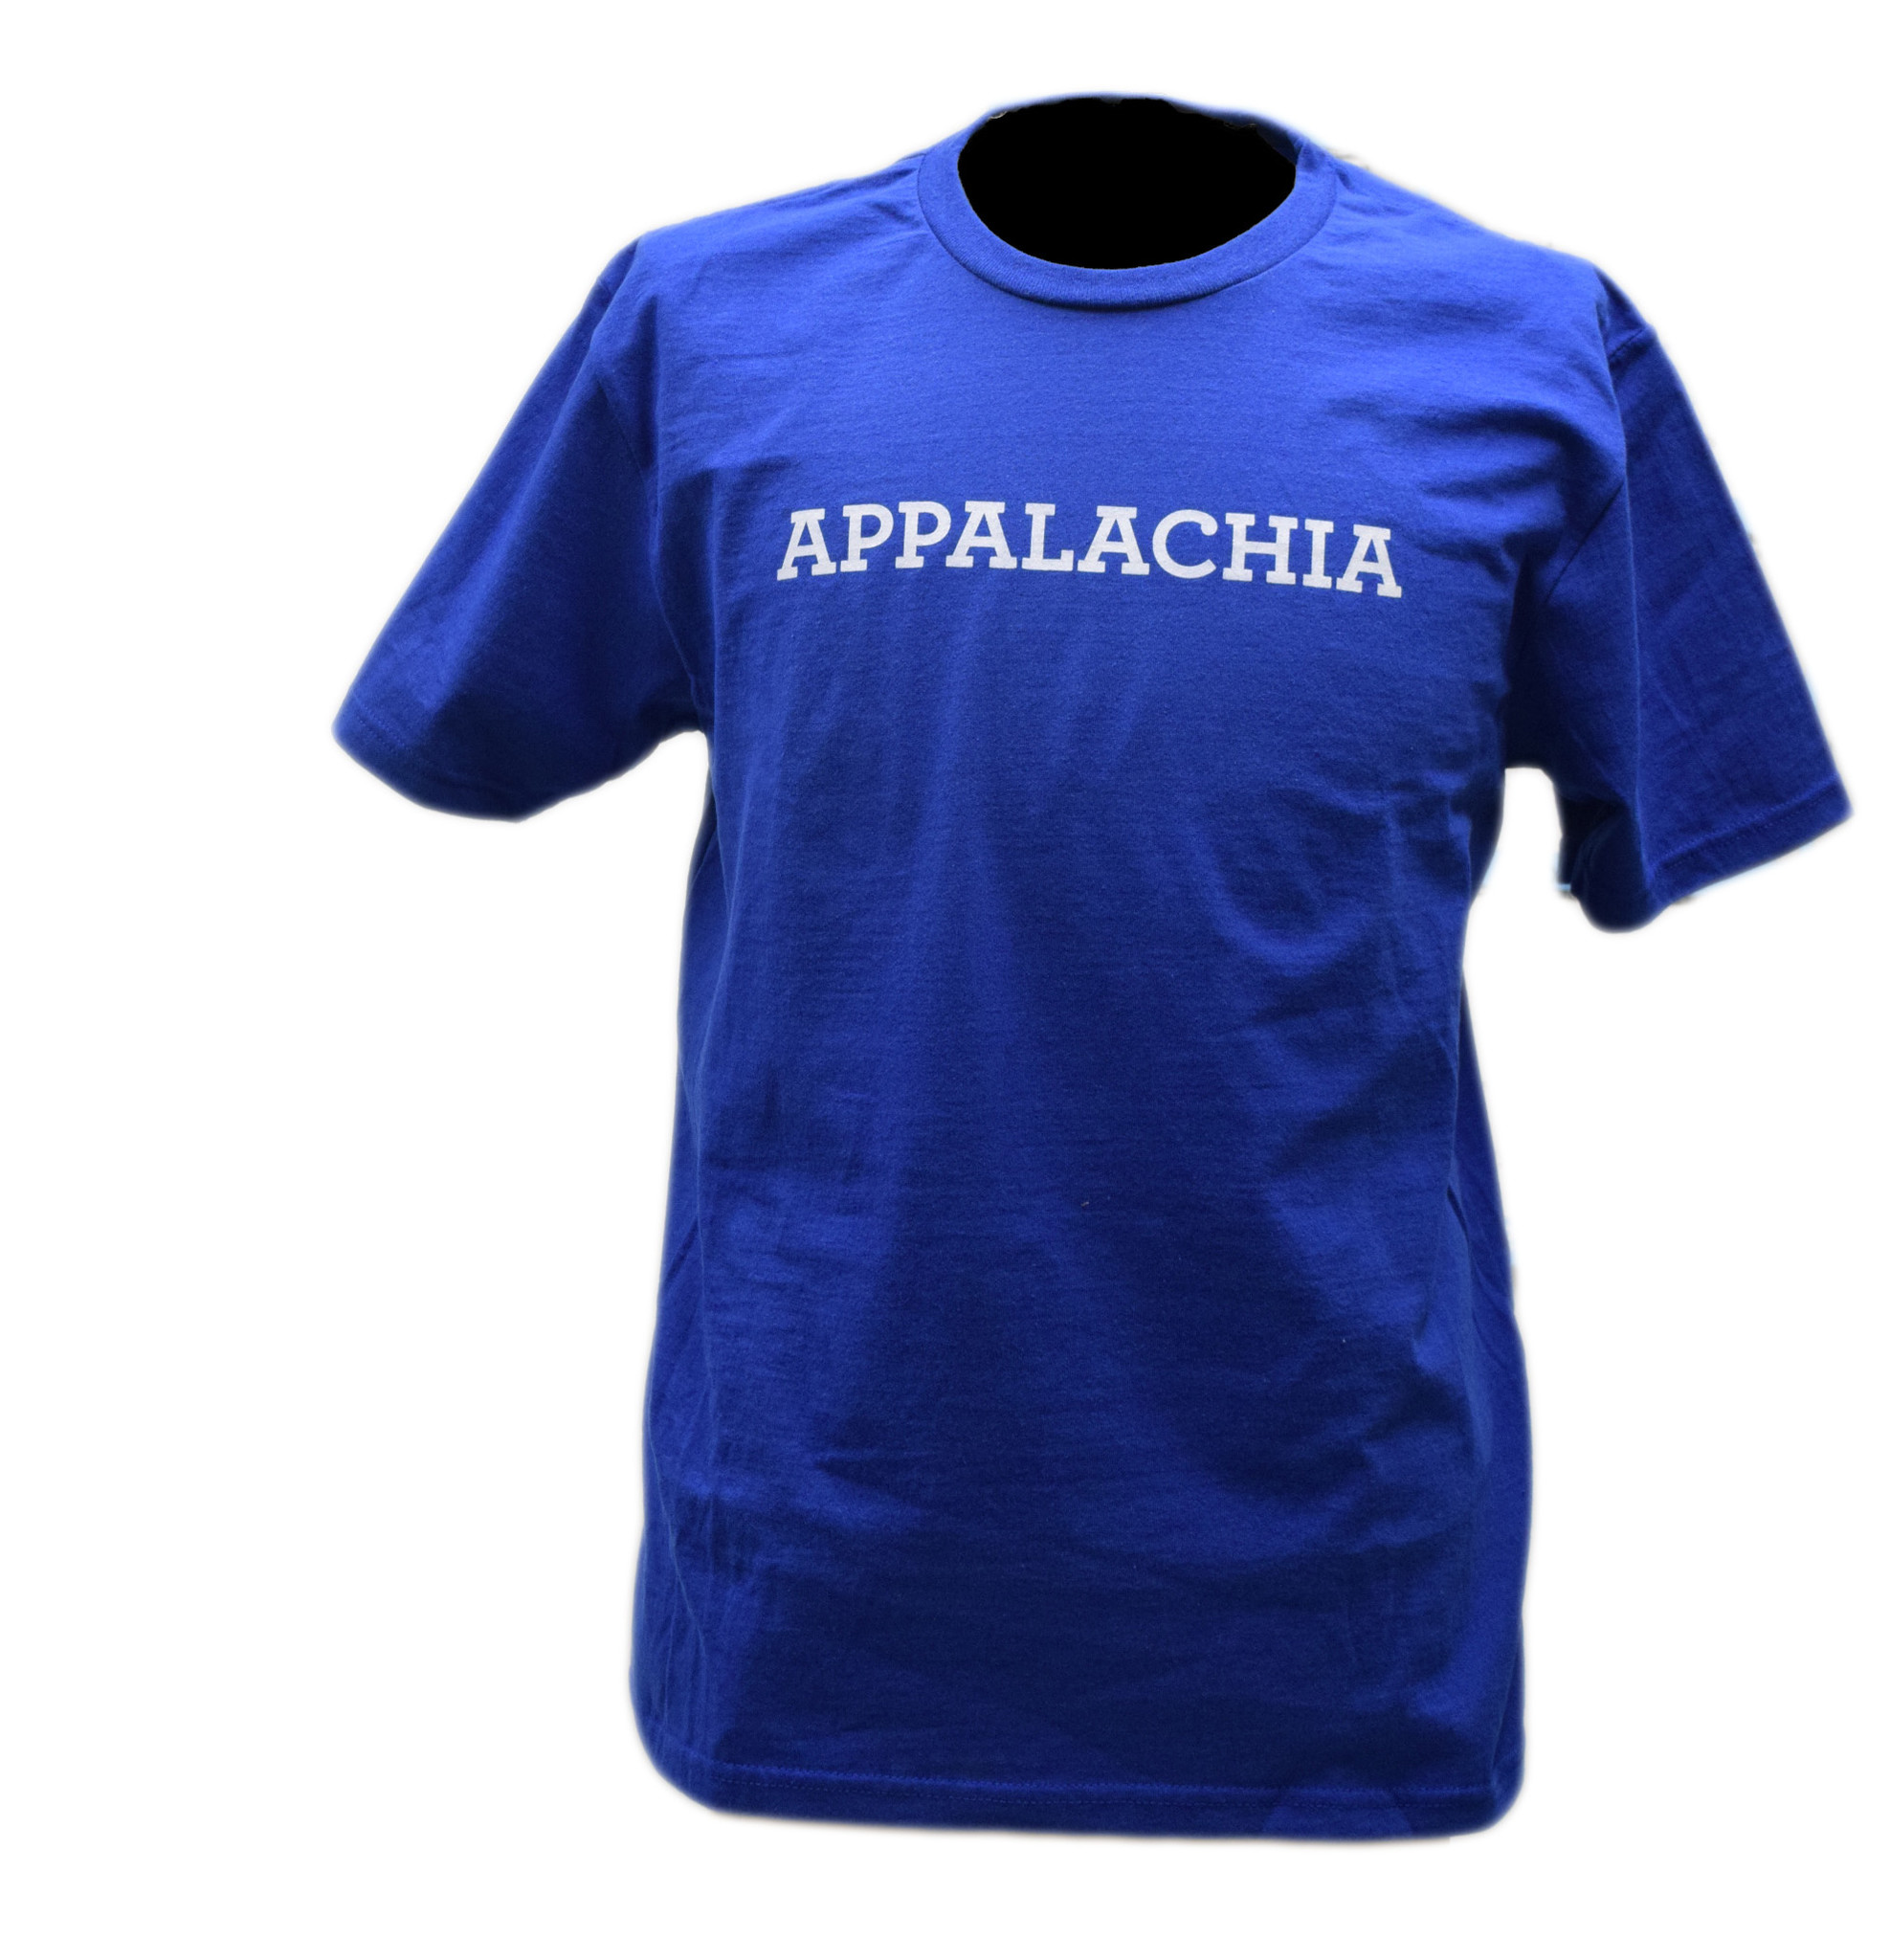 Appalachia T-shirt-1